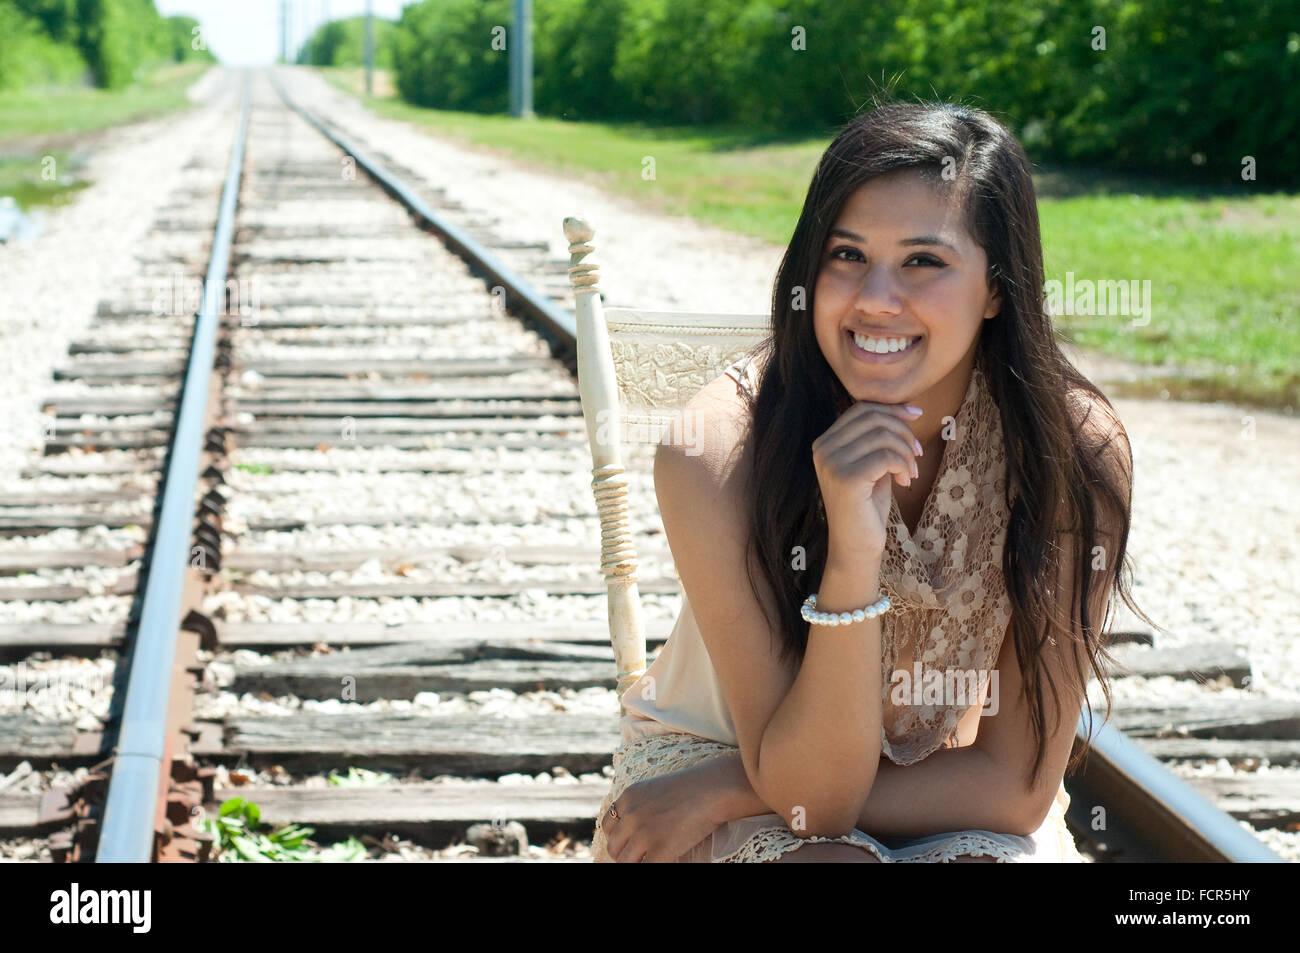 Teen girl on railroad tracks